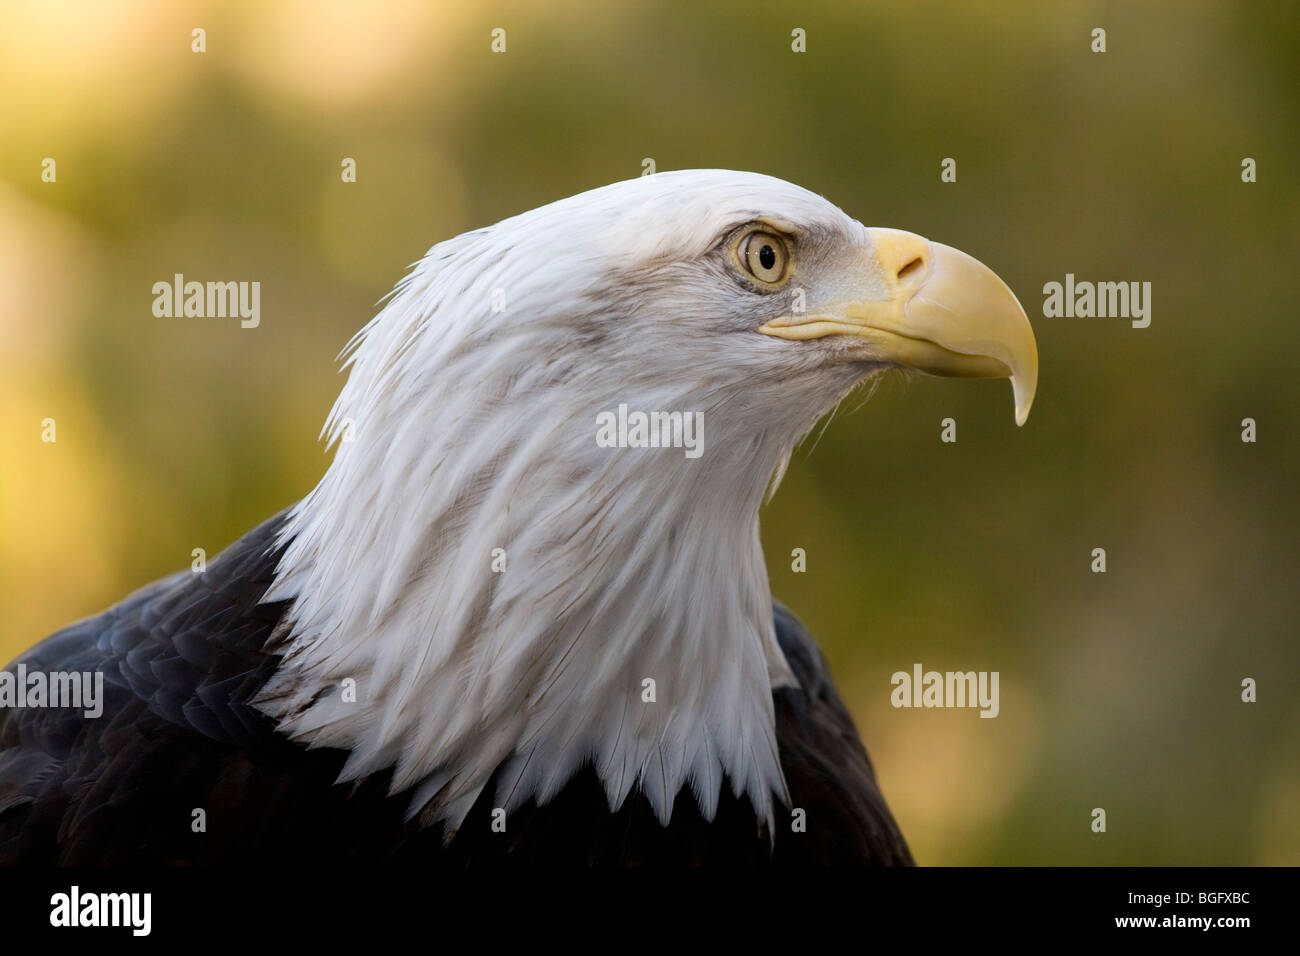 Bald Eagle in profile taken at San Francisco Zoo Stock Photo